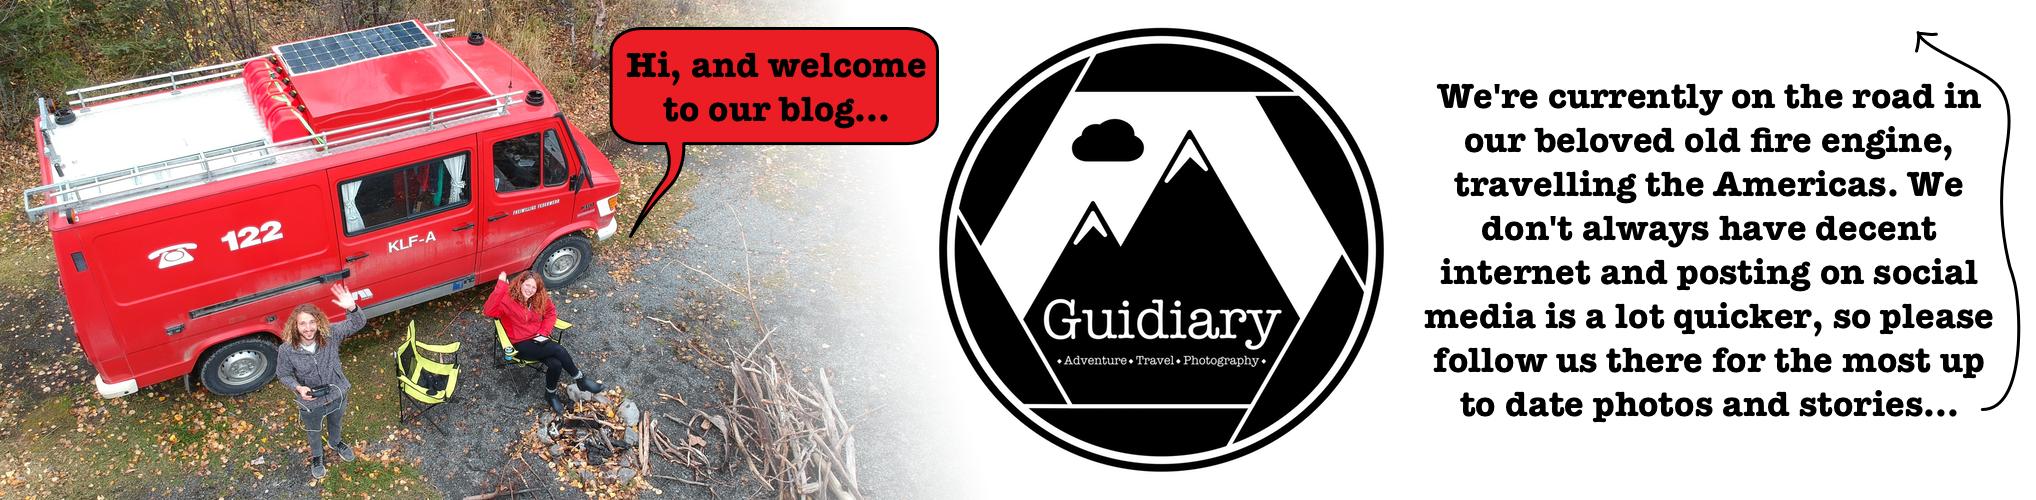 Guidiary